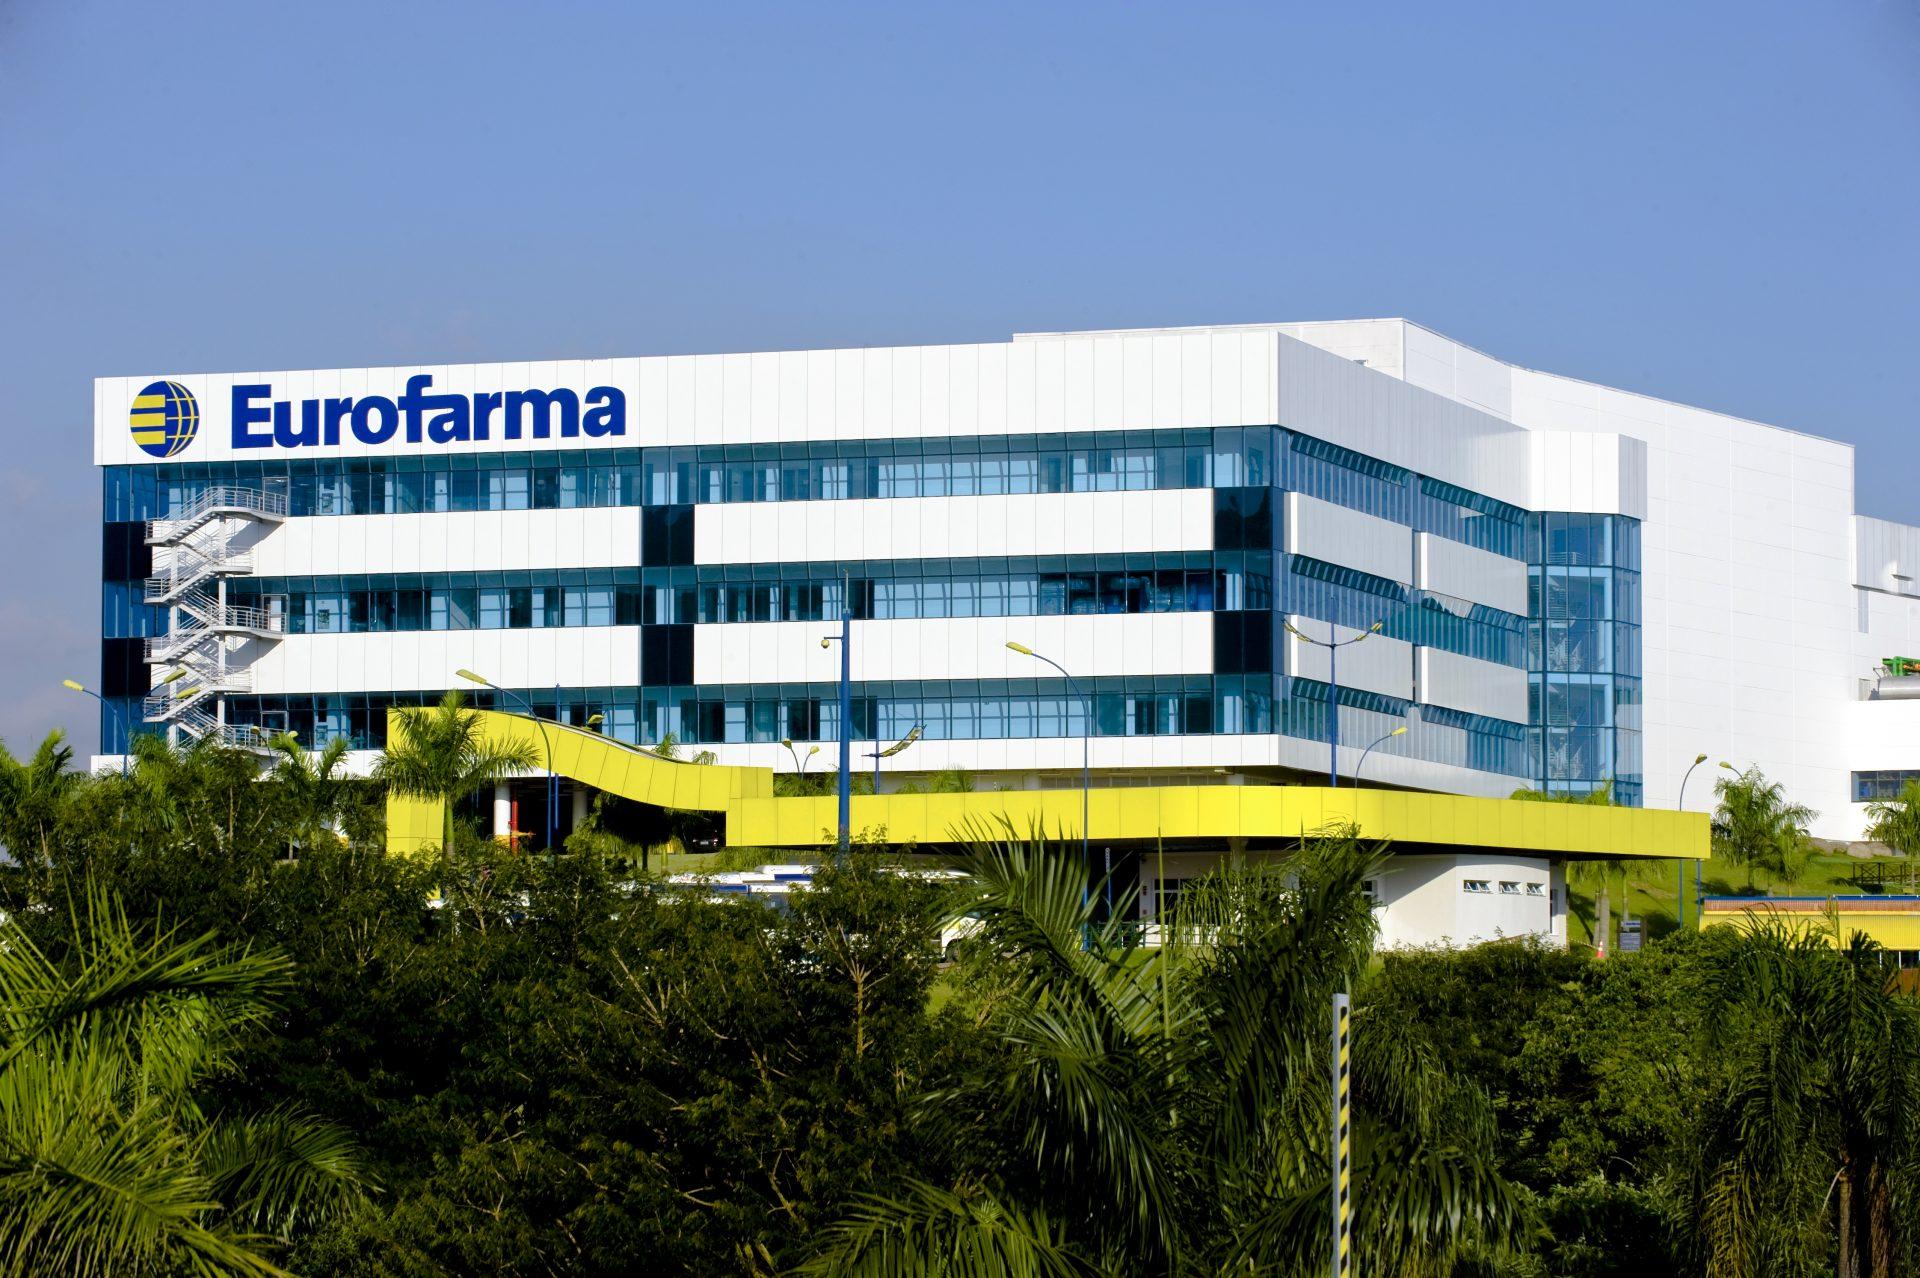 eurofarma-inaugura-primeiro-banco-de-leite-humano-privado-no-brasil